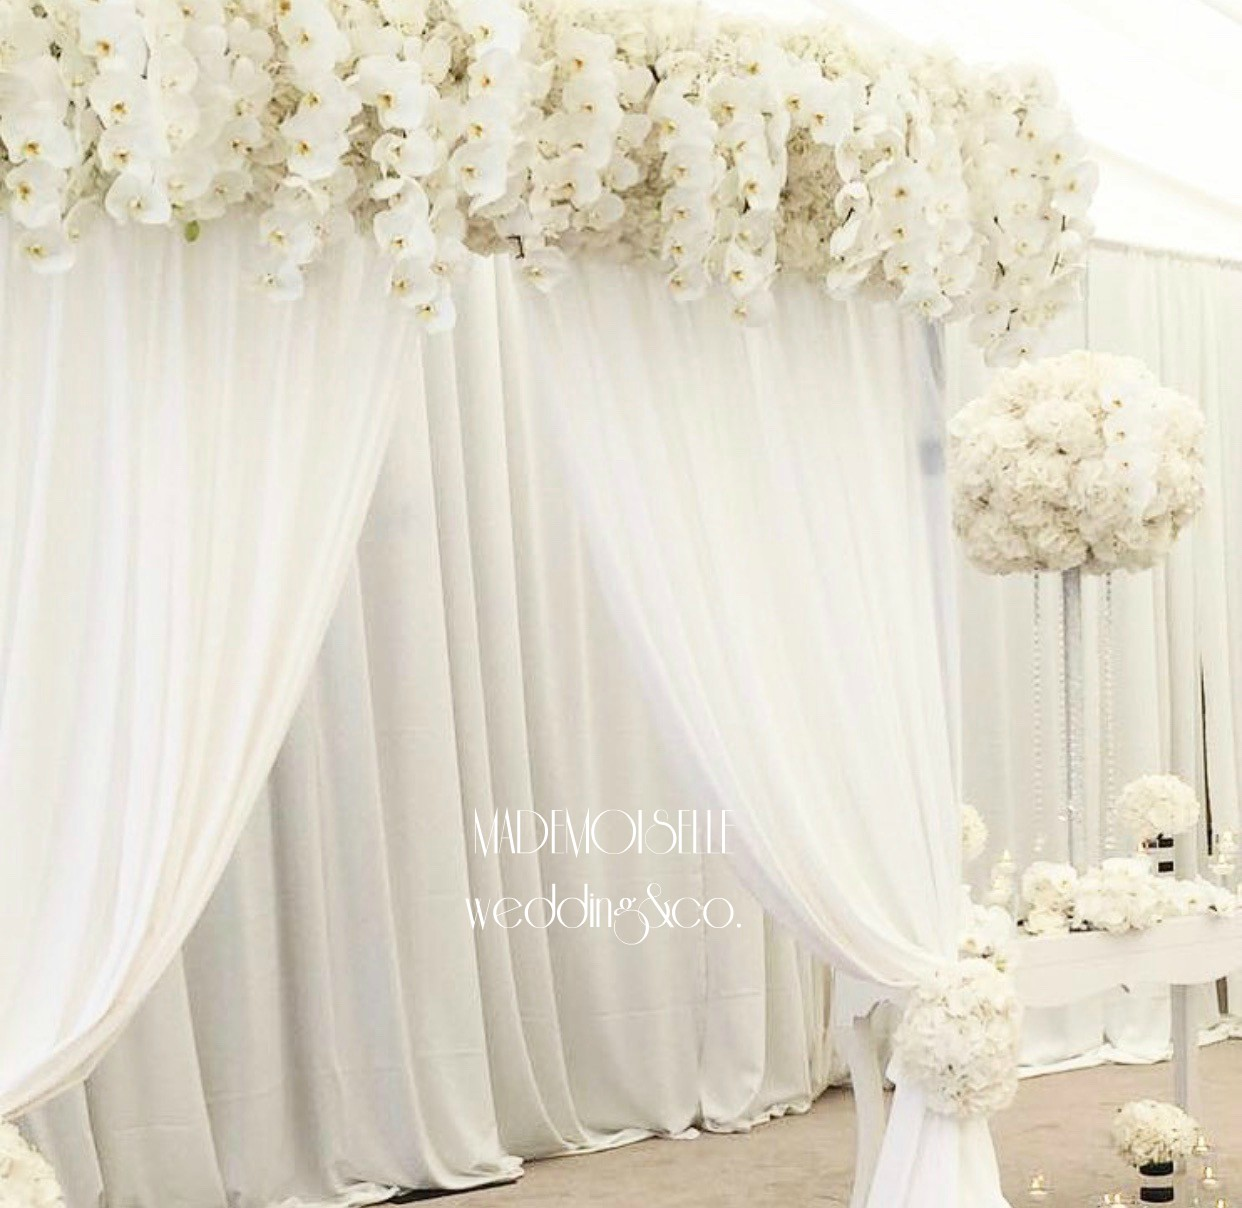 Dekoracija svadbe-dekoracija vencanja-paravan za slikanje-paravan sa cvecem-draperija-cvetni venac-pozadina za slikanje-zid za slikanje